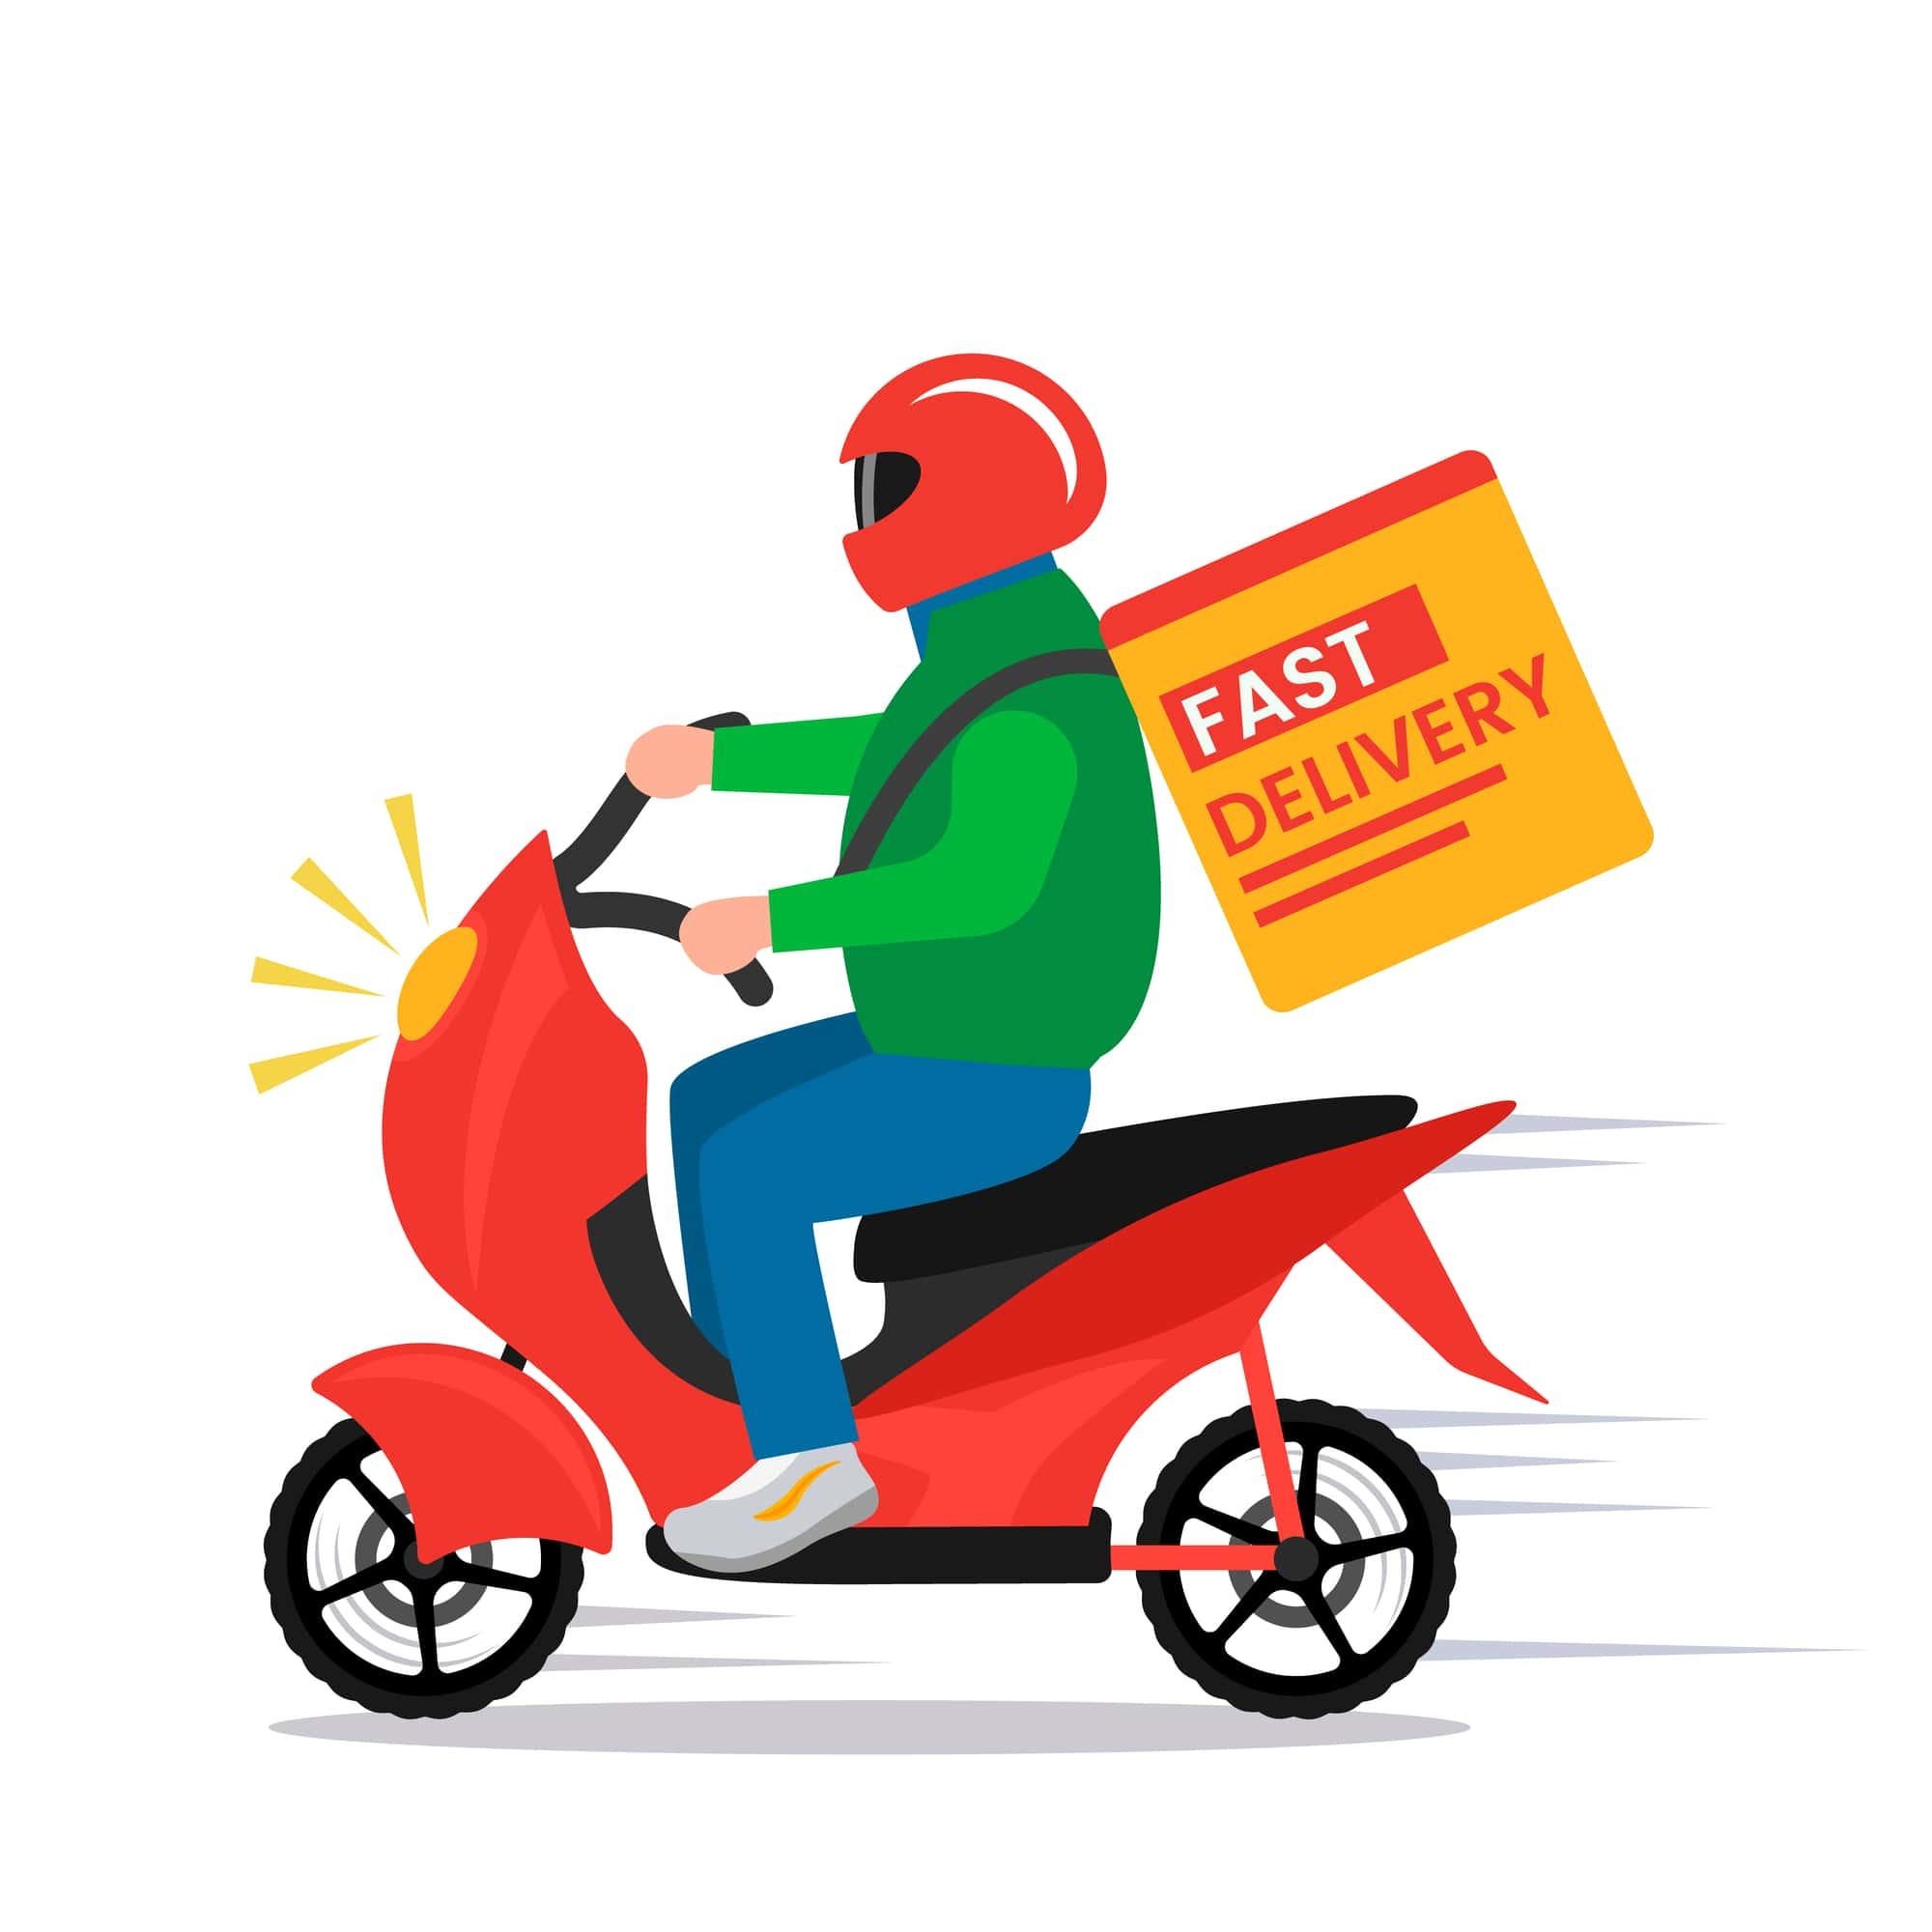 Delivery Service Business in Dubai